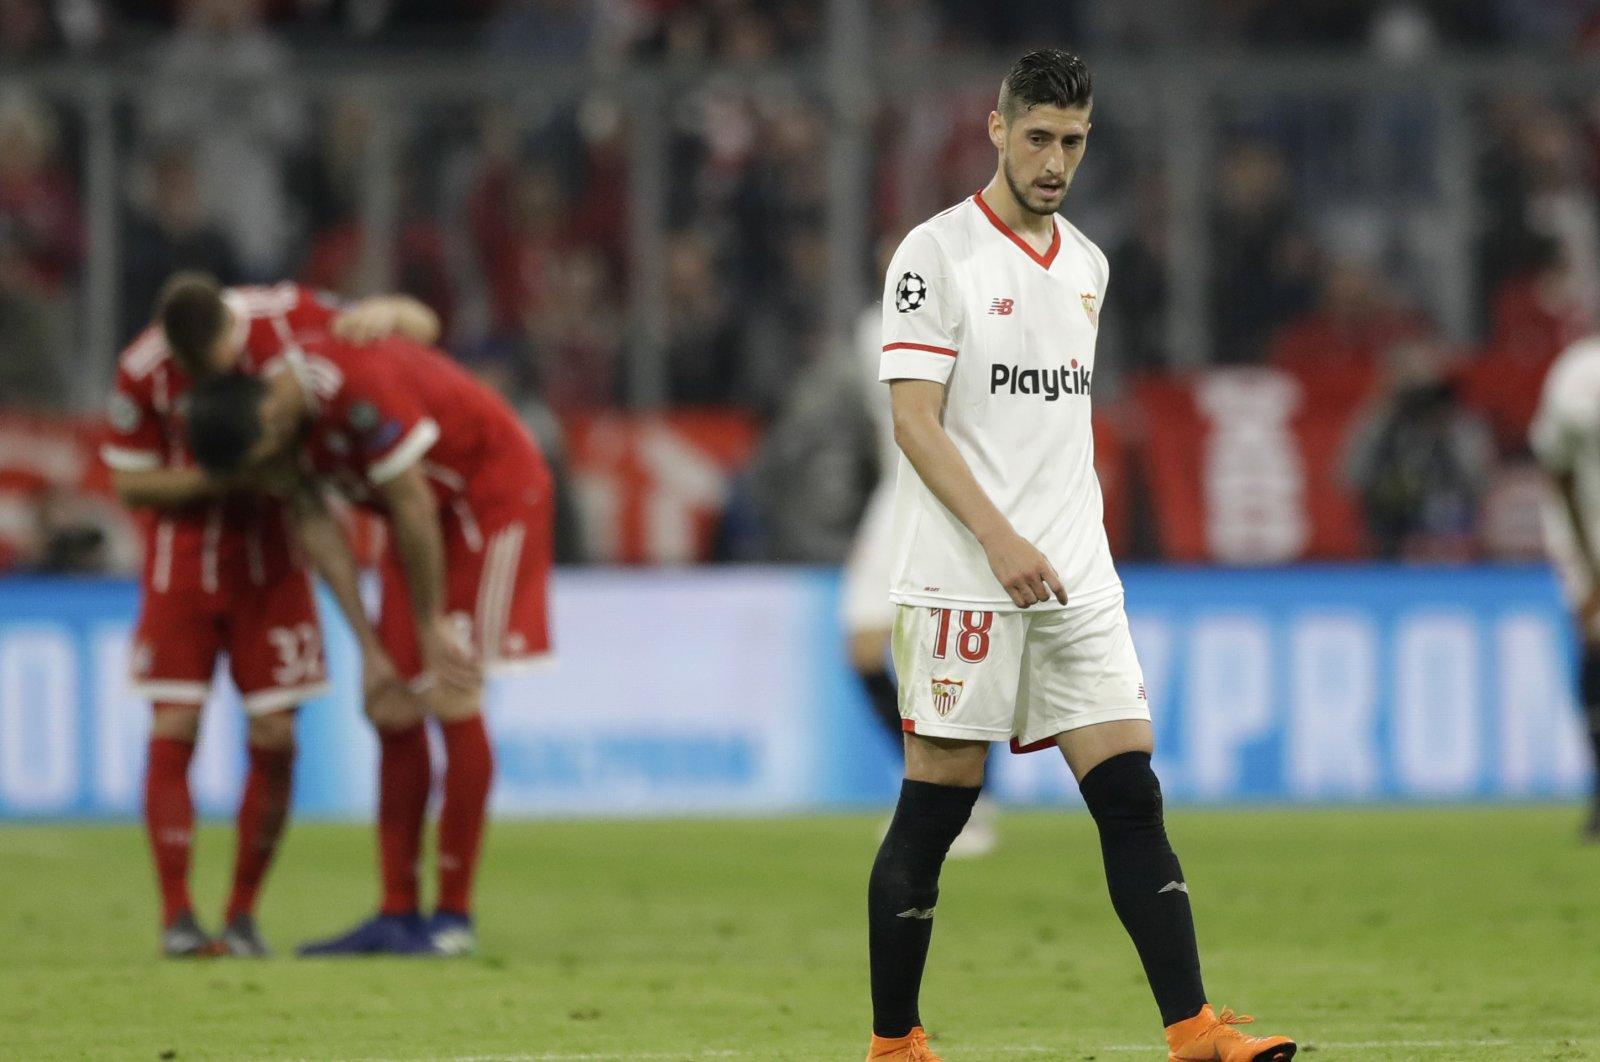 Sevilla's Sergio Escudero reacts during a Champions League quarterfinal match against Bayern Munich, Munich, Germany, April 11, 2018. (AP Photo)